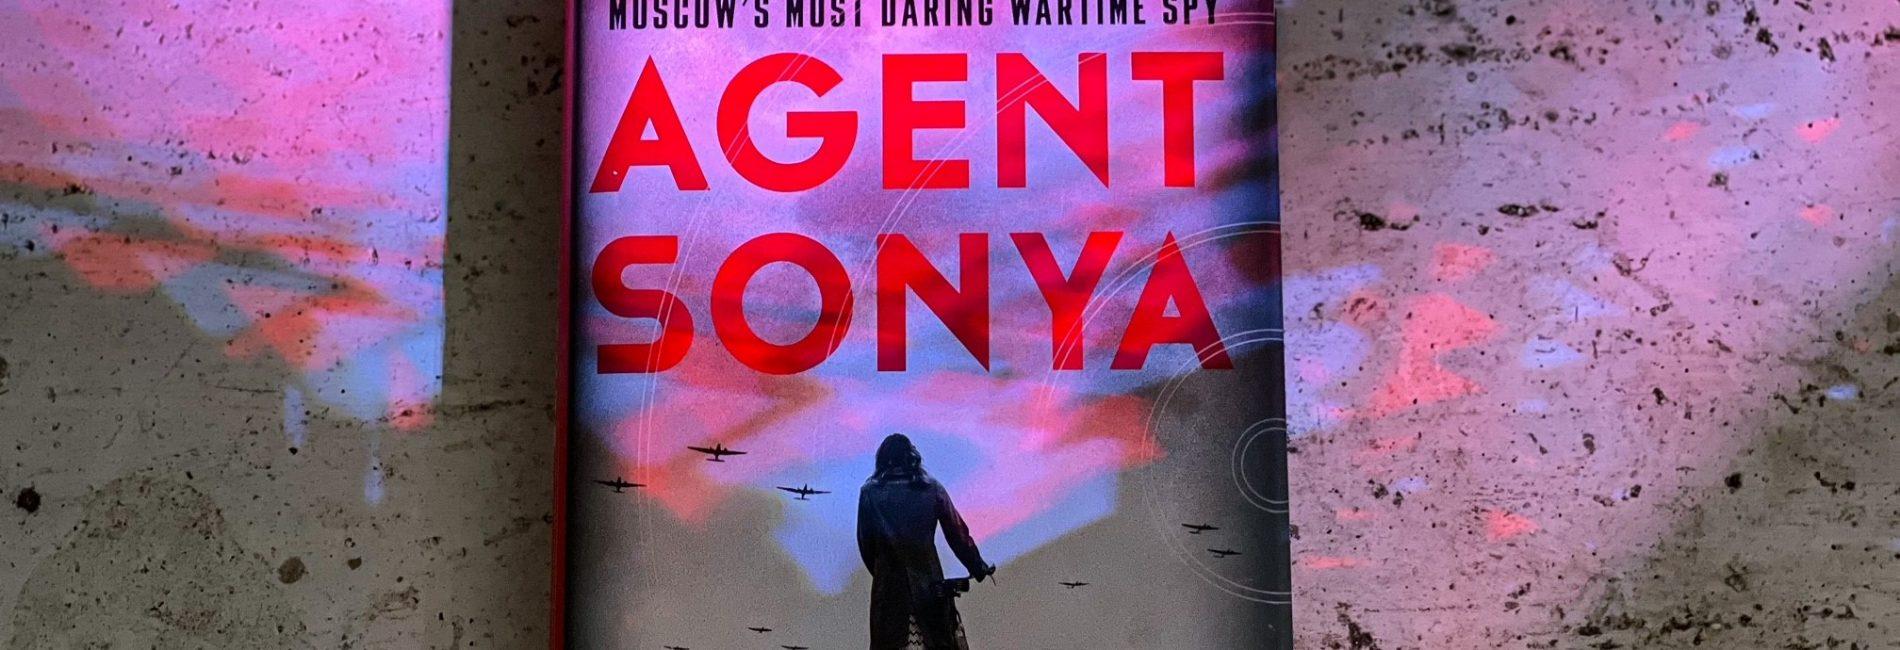 THE ZEG BOOKCLUB: AGENT SONYA